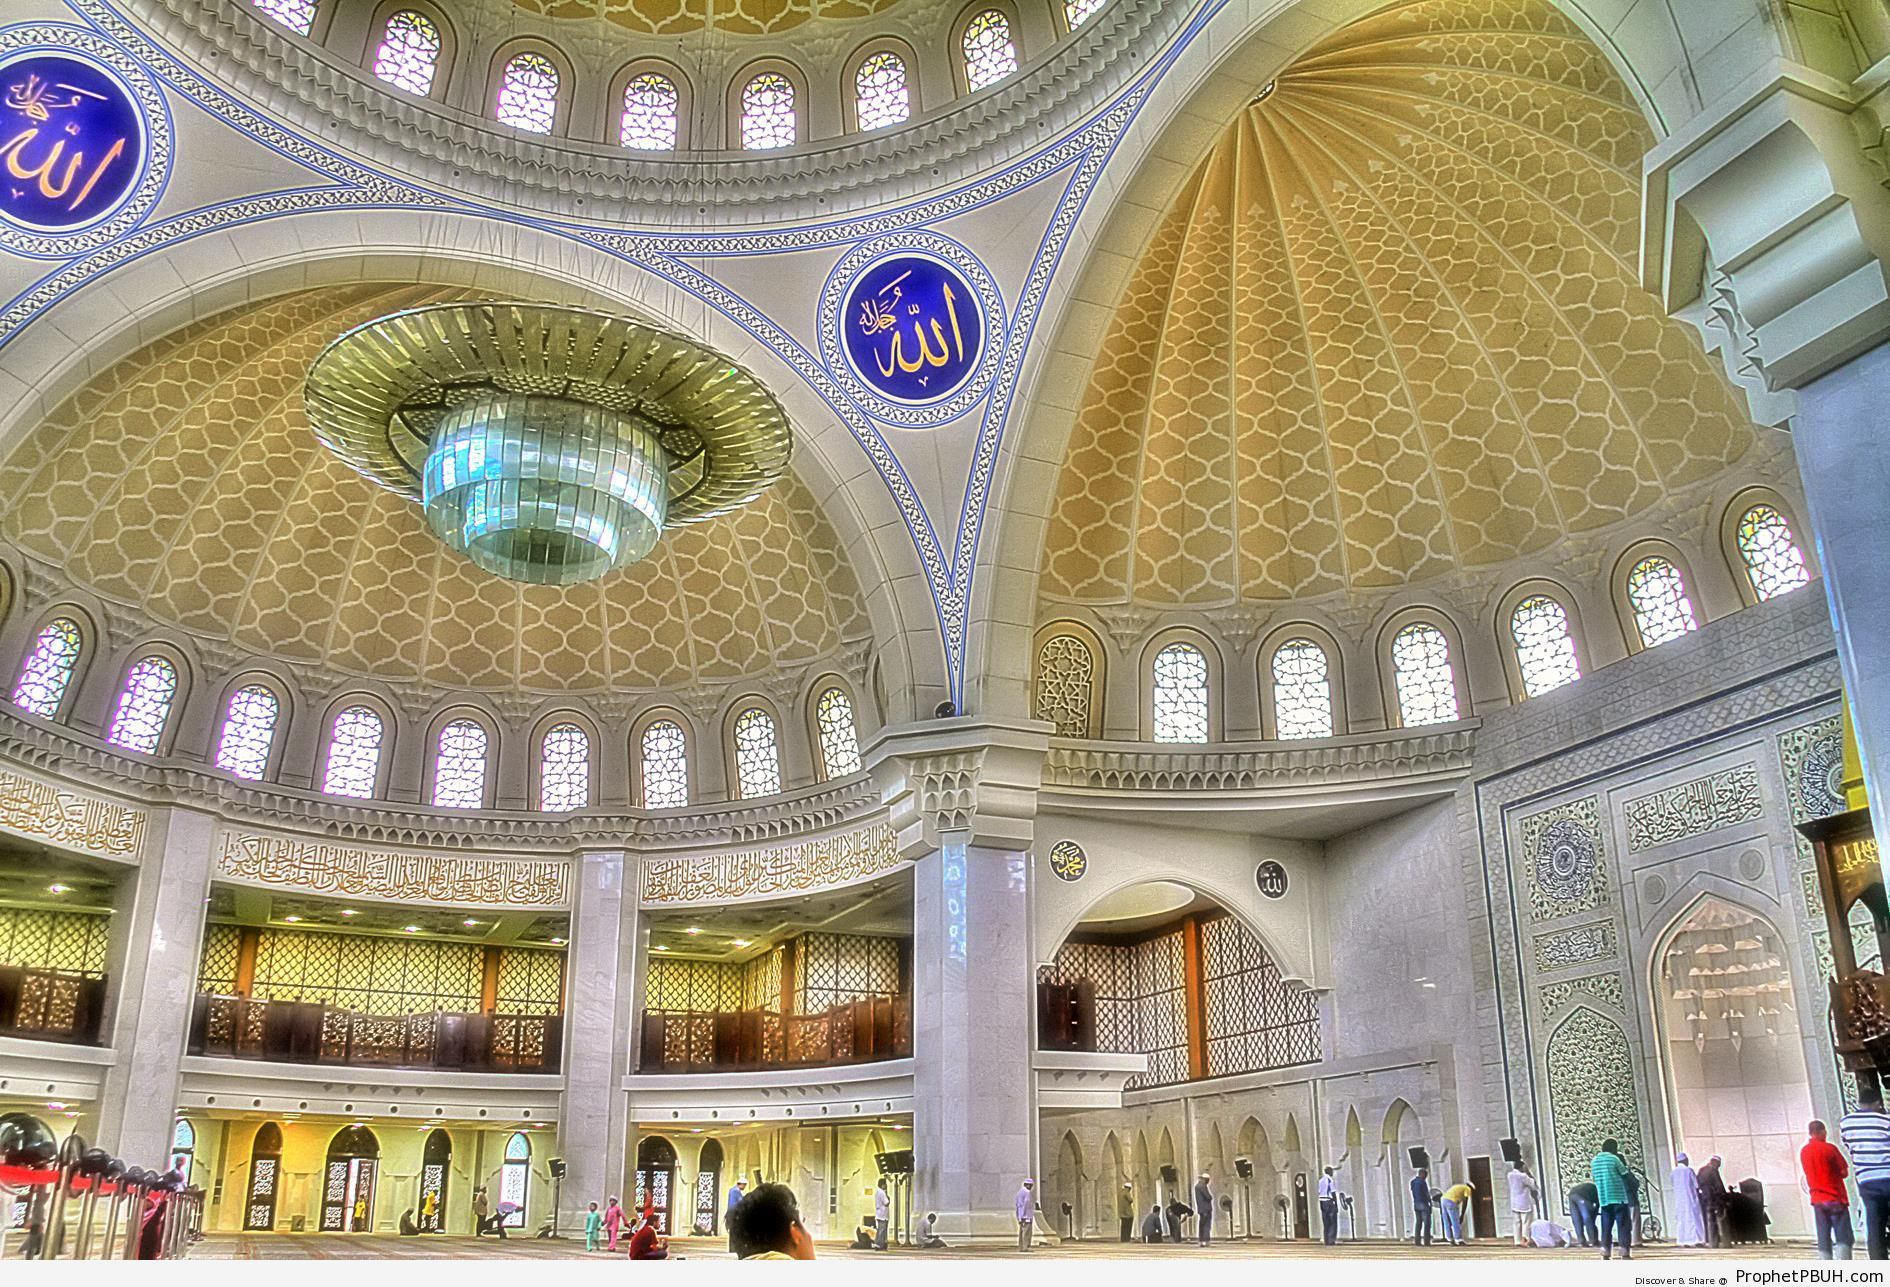 Inside Masjid Wilayah in Kuala Lumpur, Malaysia - Islamic Architecture -Picture